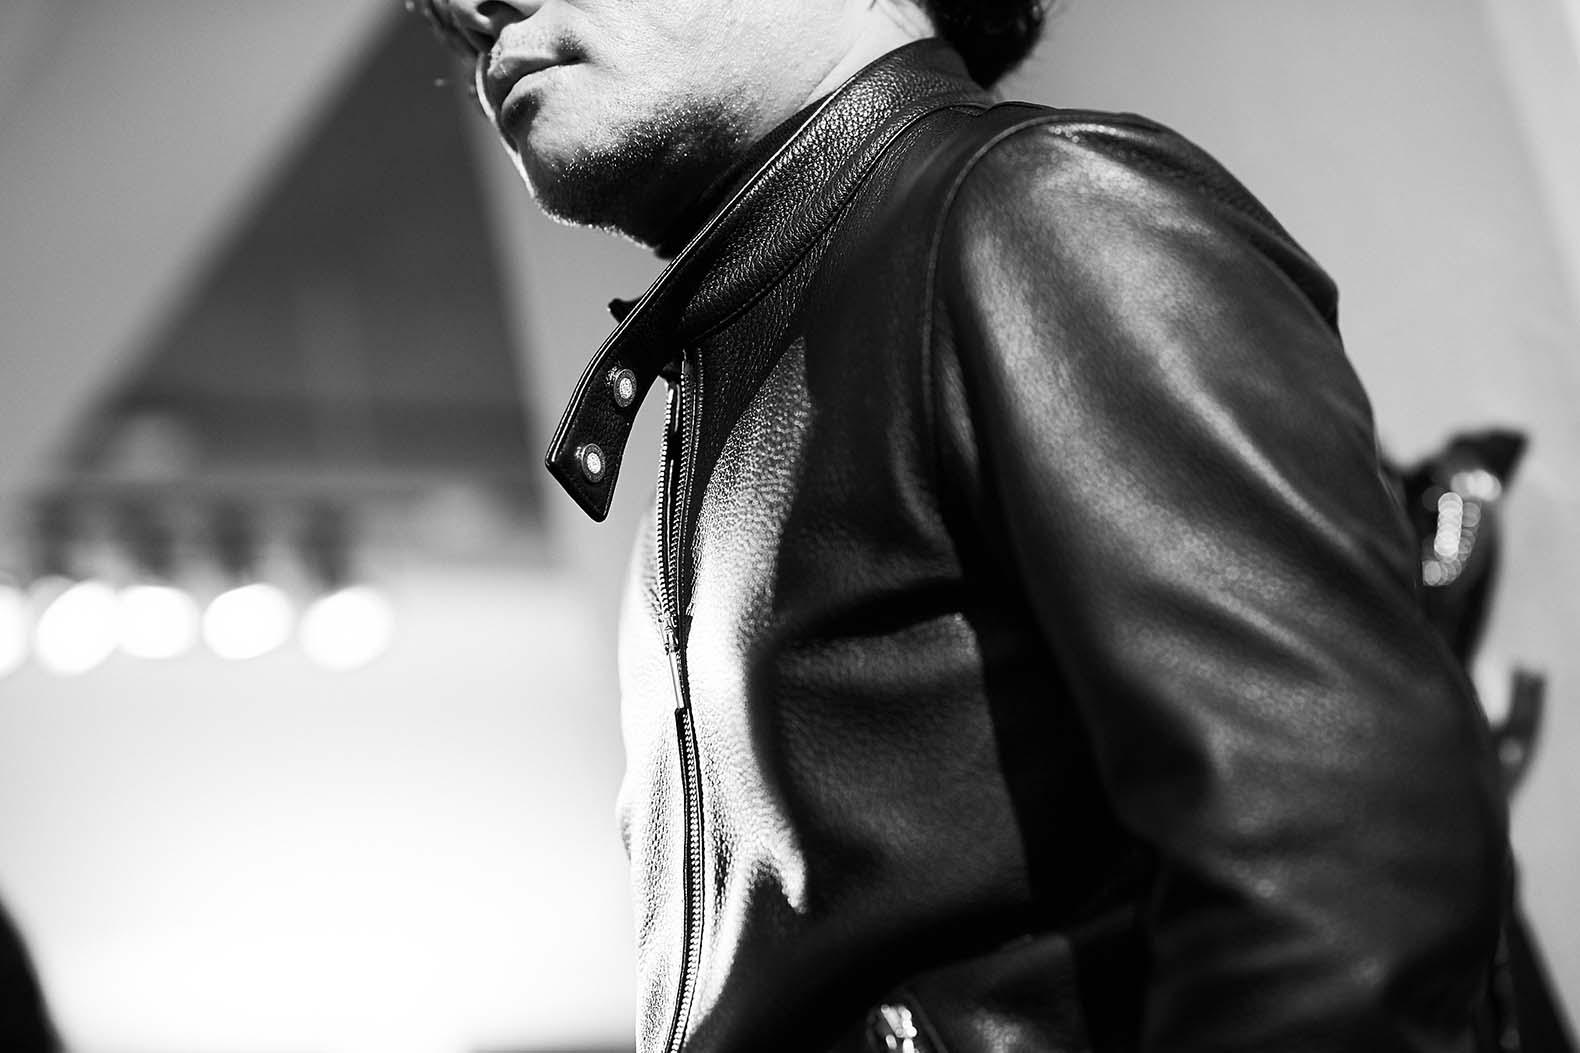 B.R.MALLにNEWショップが登場 アルト・エ・デリットの渾身珠玉のセレクトアイテム&ブランド